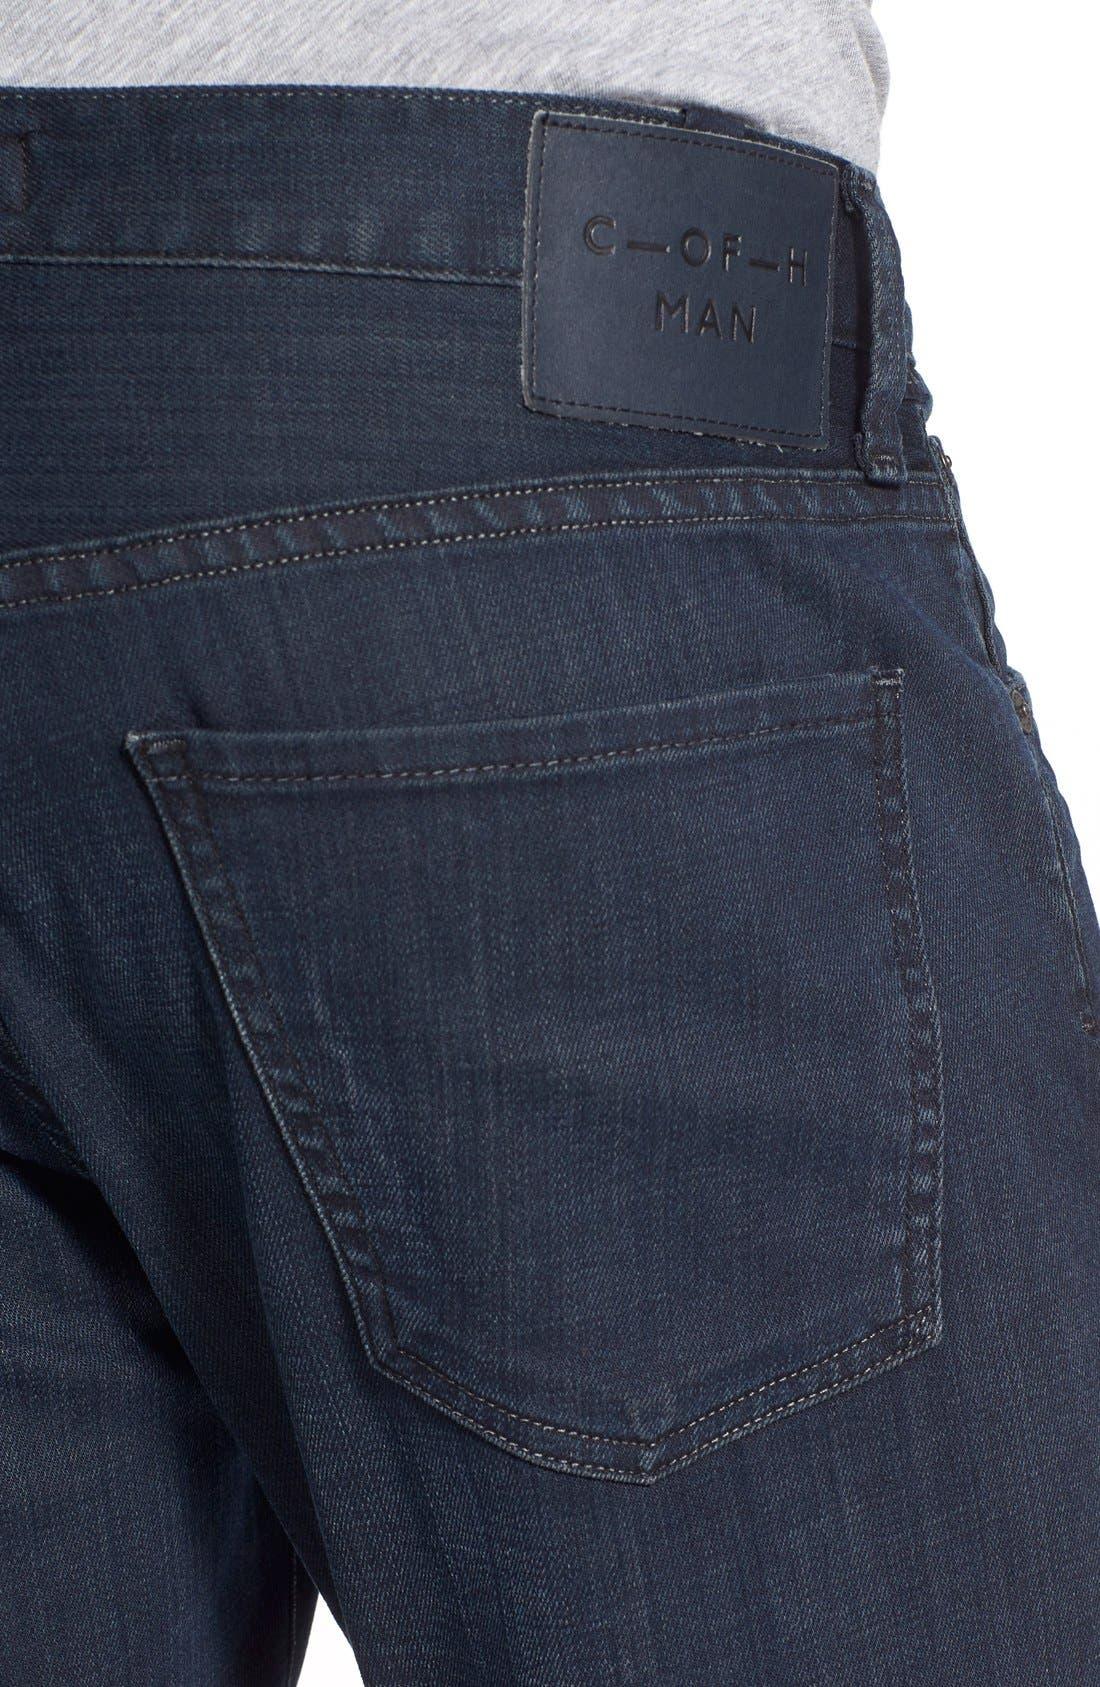 Gage Slim Straight Leg Jeans,                             Alternate thumbnail 5, color,                             474